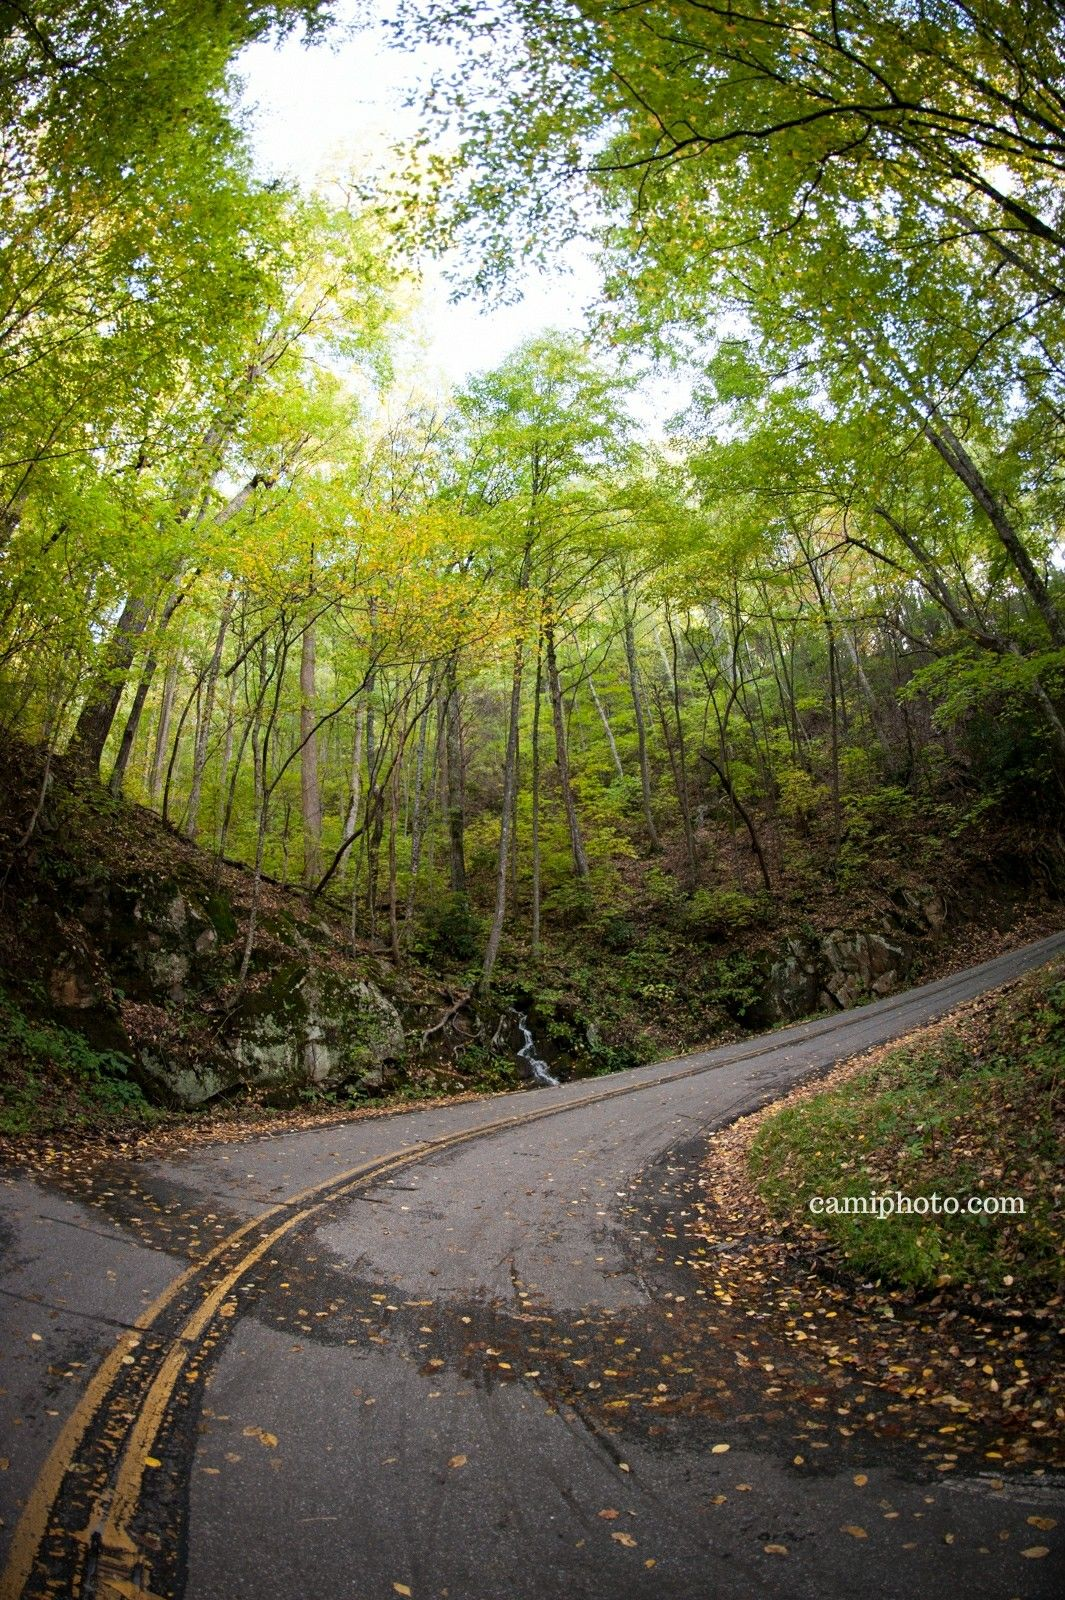 fall foliage surrounding a